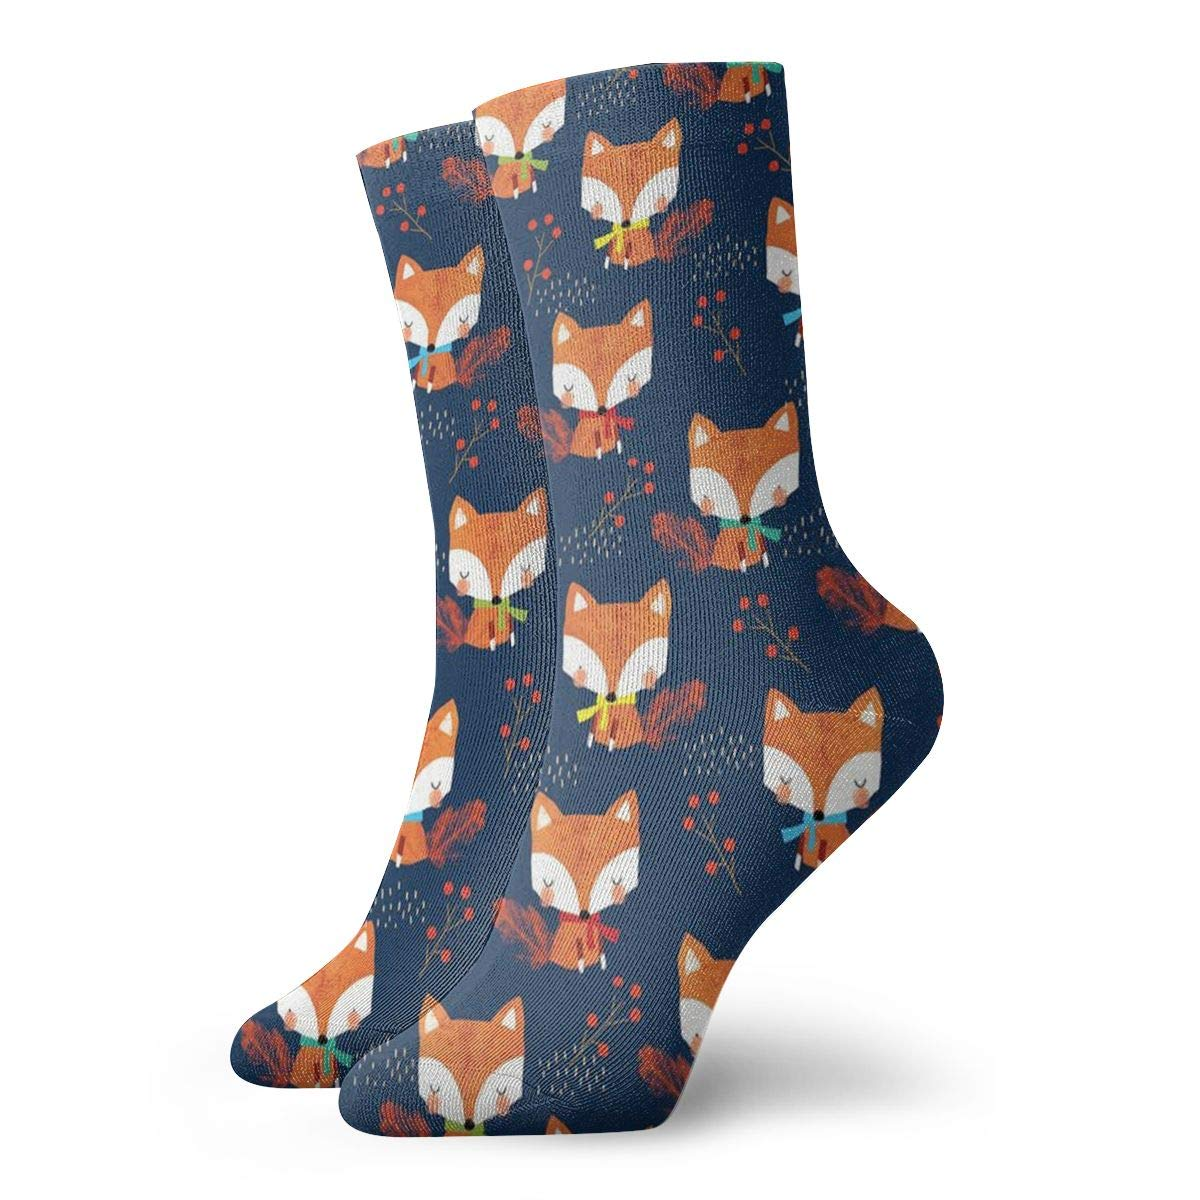 Patterns Unisex Funny Casual Crew Socks Athletic Socks For Boys Girls Kids Teenagers